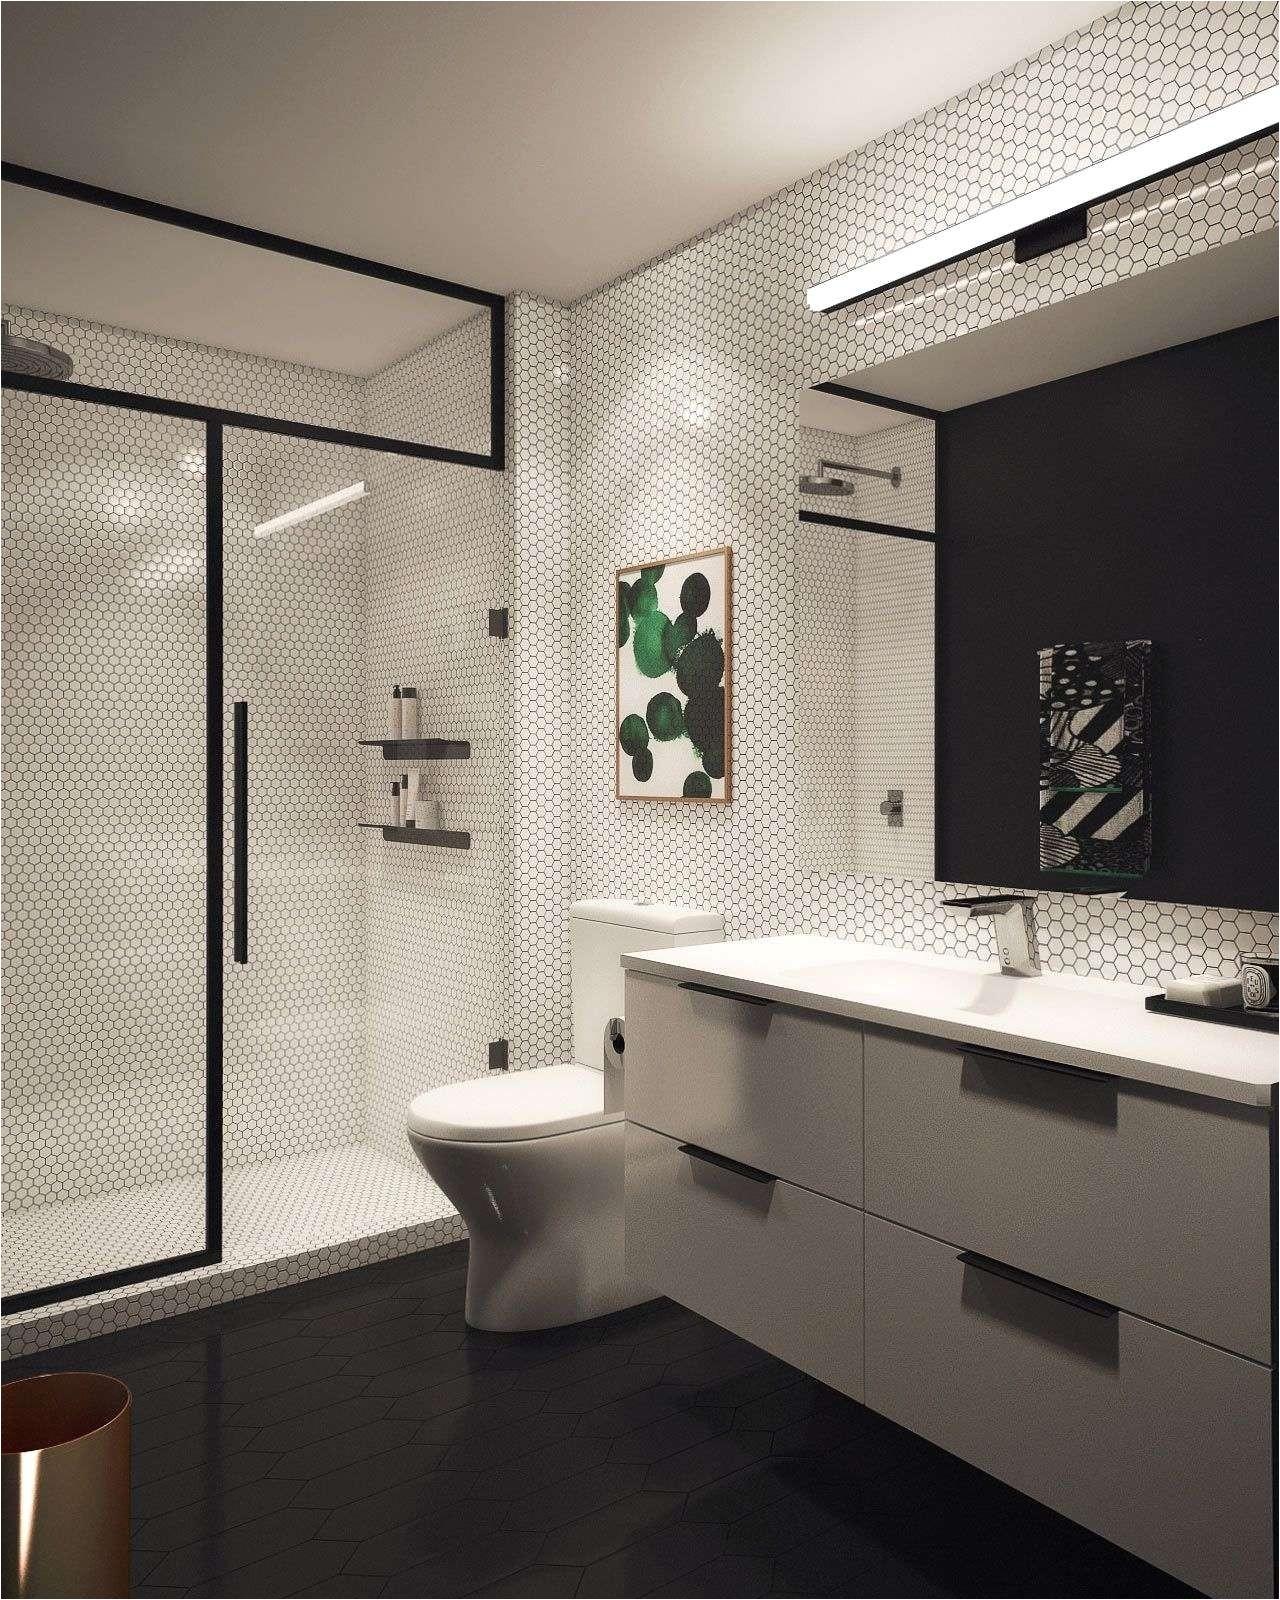 Glass Tile Bathroom Design Ideas Glass Tile Bathroom Ideas Sensational Bathrooms Ideas Valid Lovely